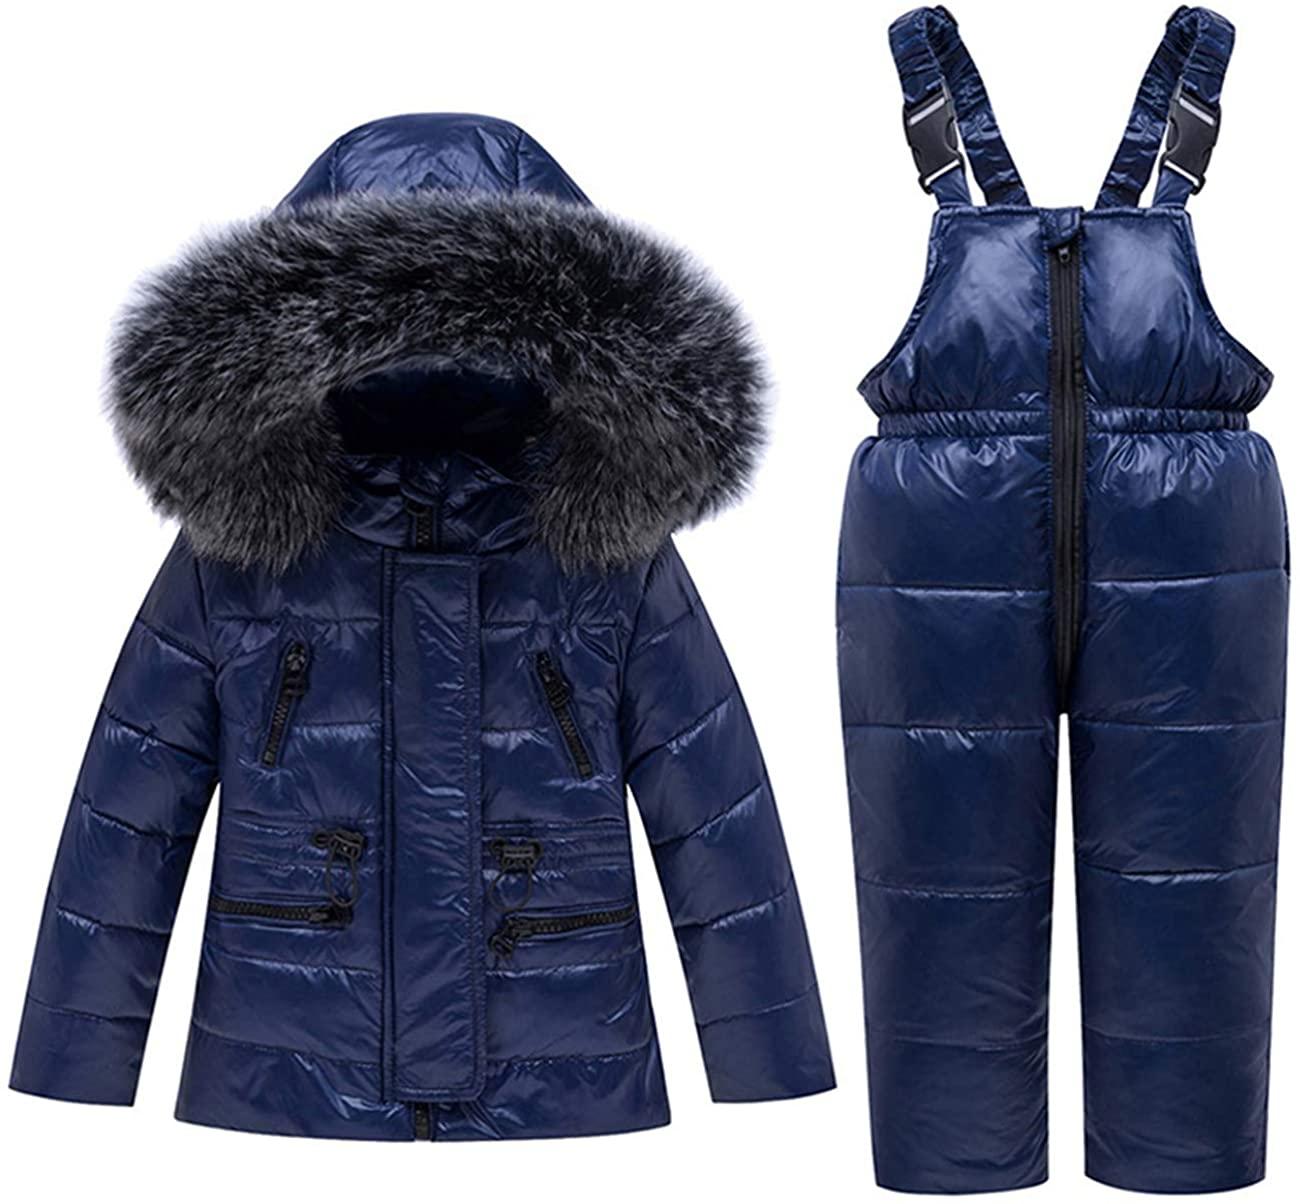 REWANGOING 2 Pcs Baby Girls Winter Warm Fur Trim Hooded Soild Zipper Puffer Down Jacket Snowsuit with Ski Bib Pants Set